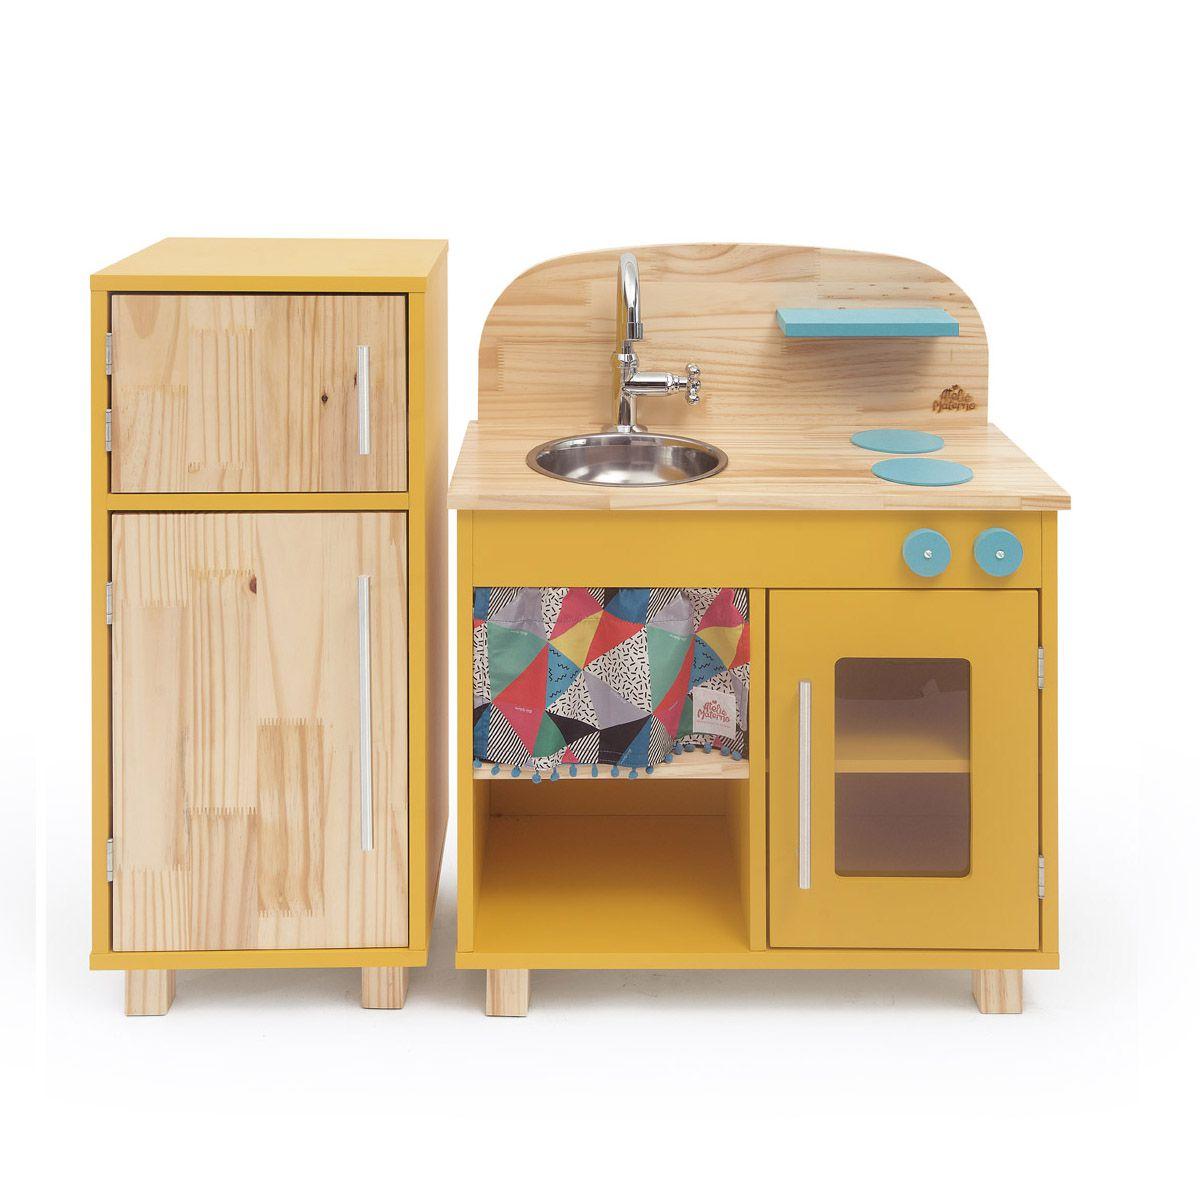 Kit Mini Cozinha e Geladeira - Amarela